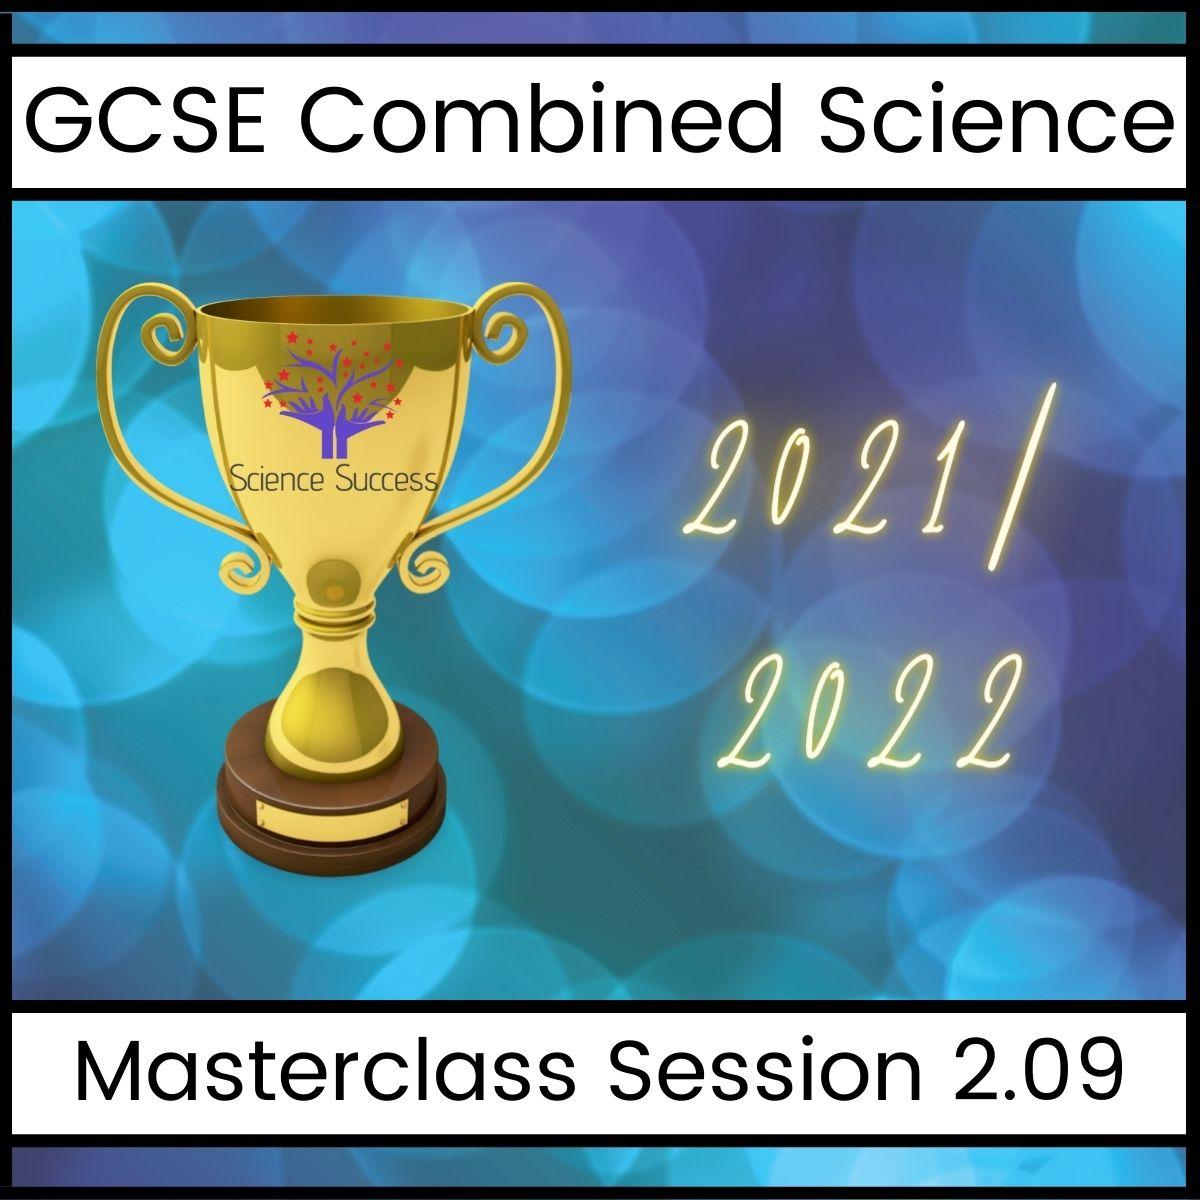 2.09 C 202122